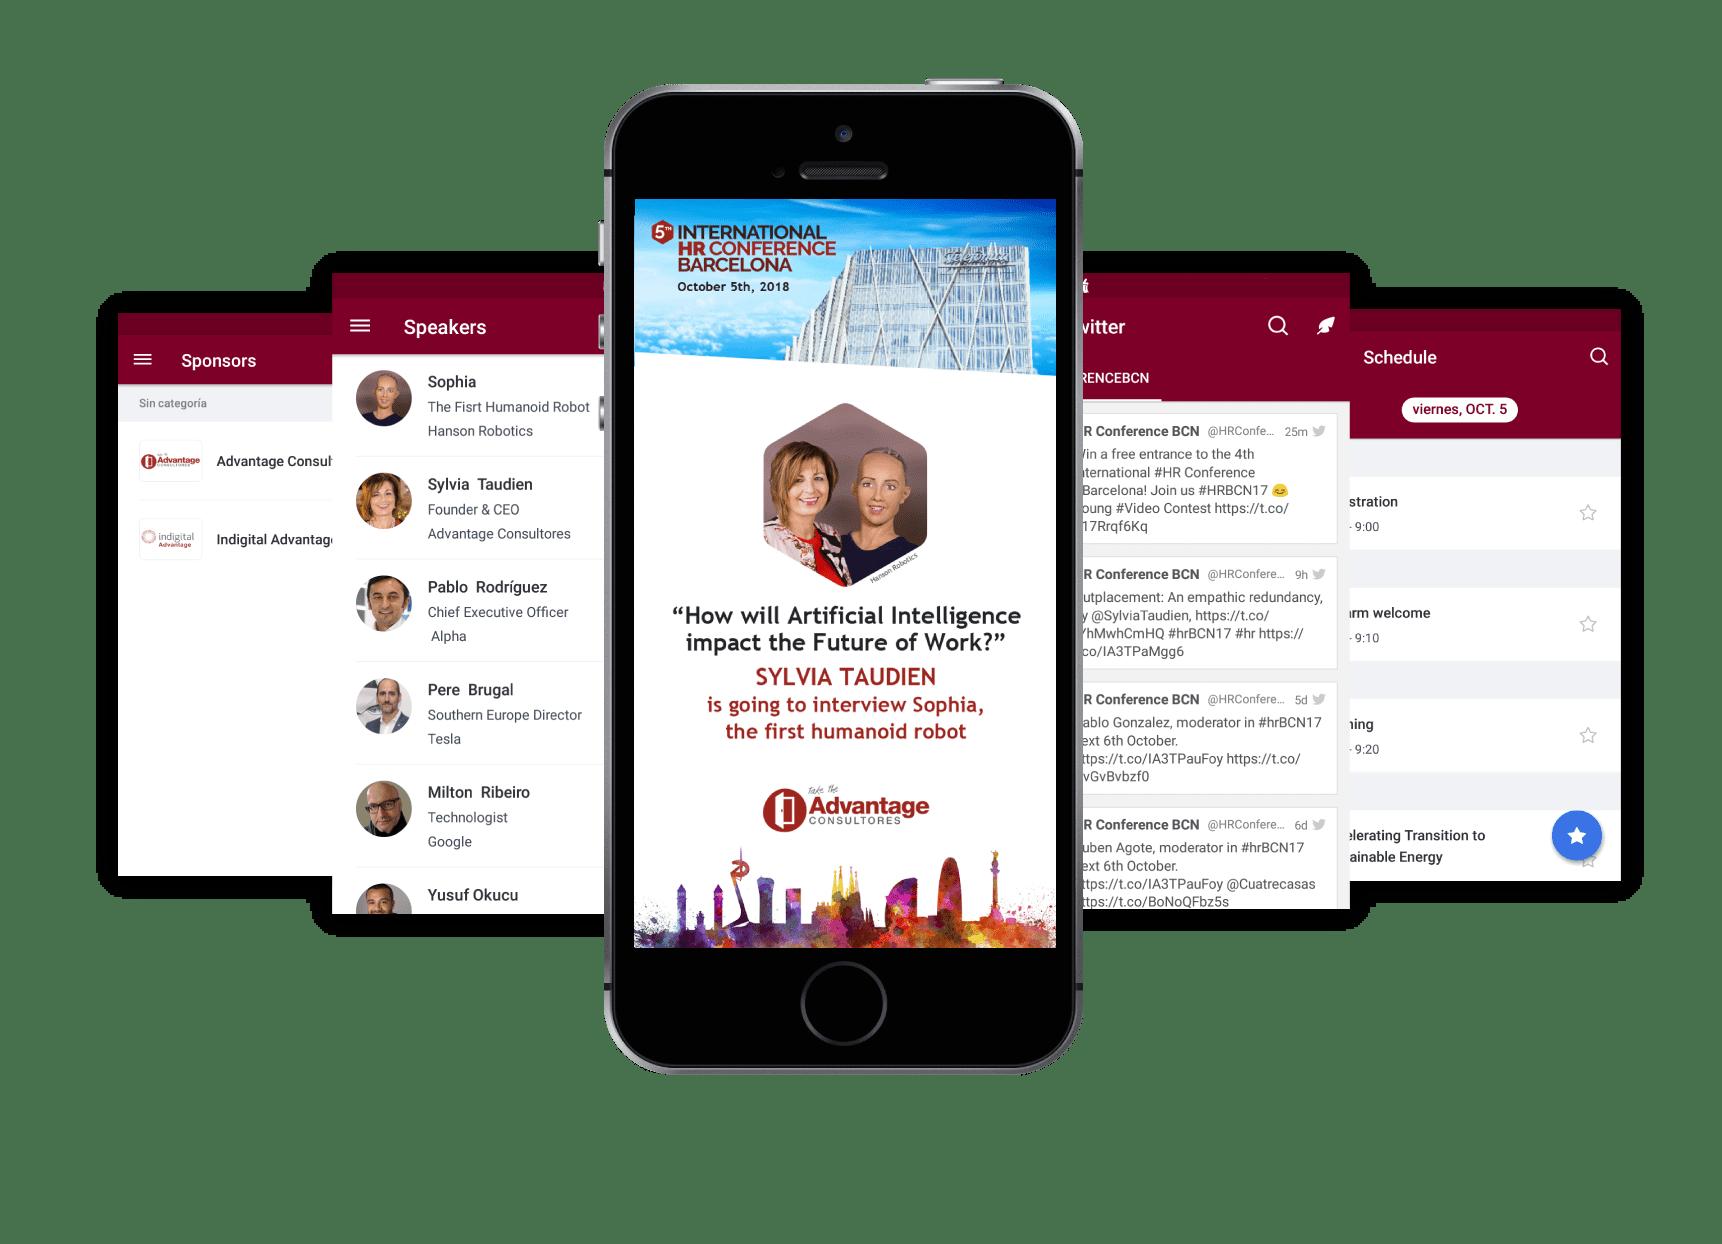 mobile-app-image-min